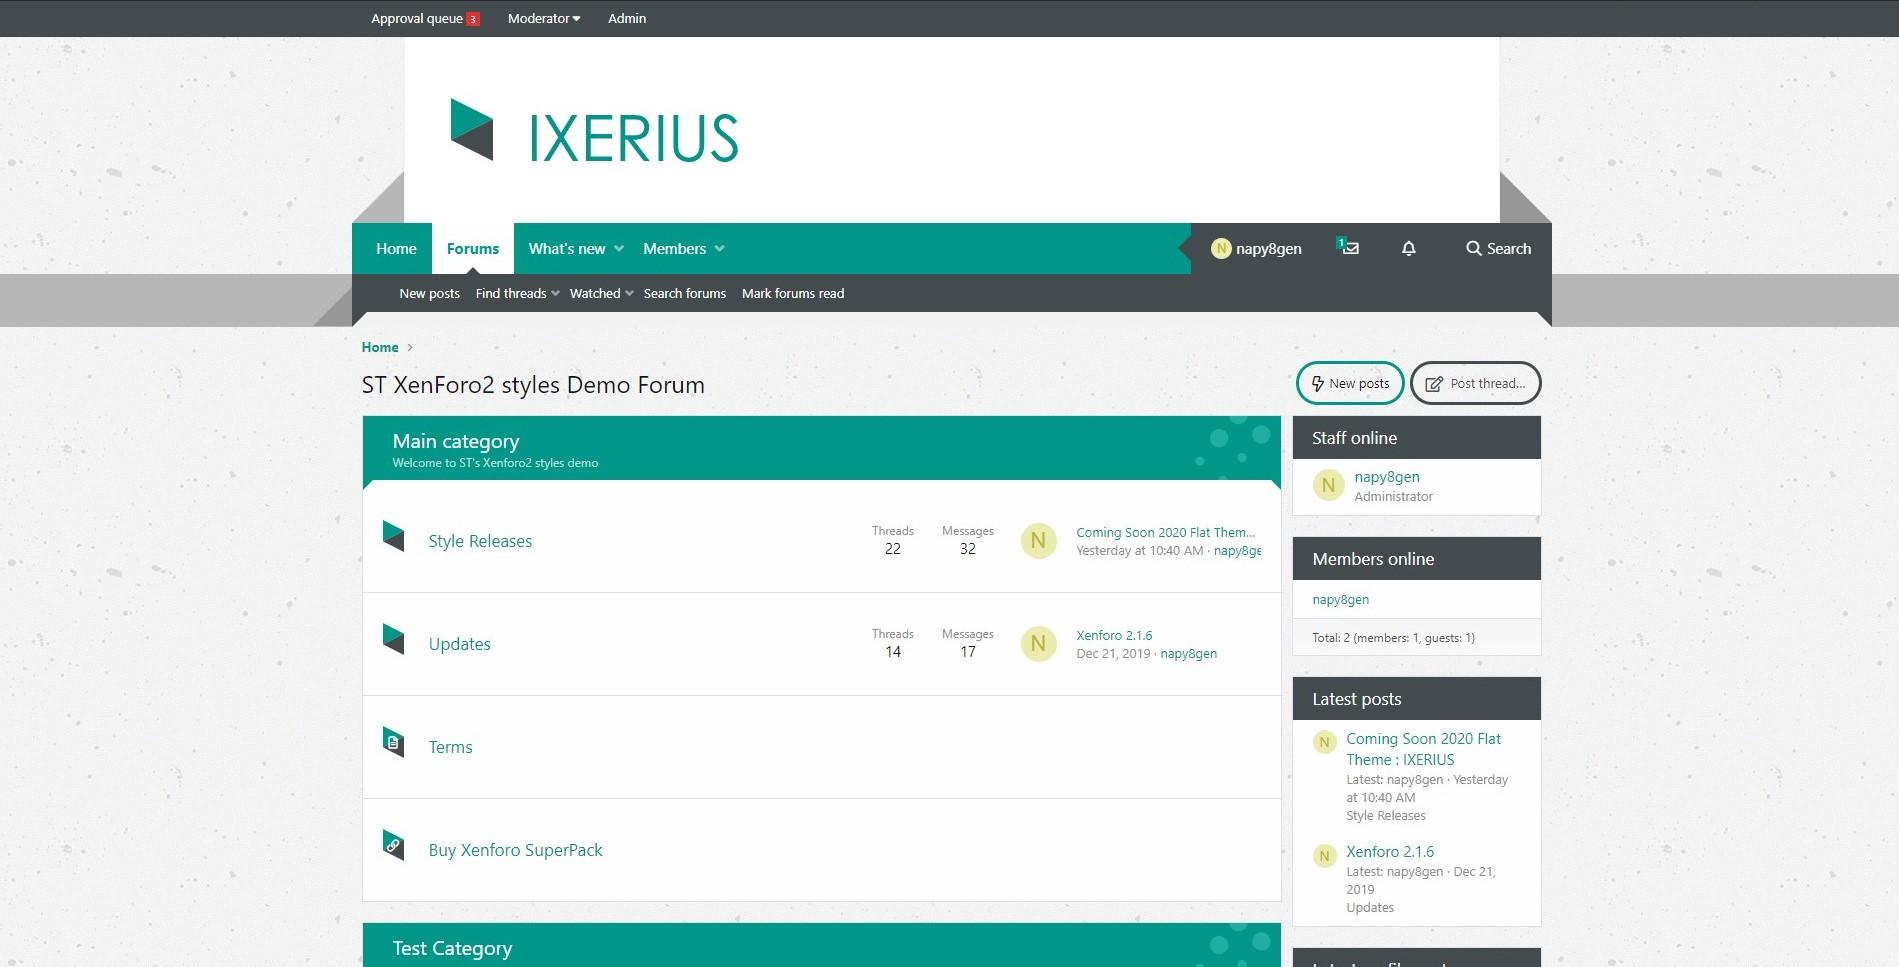 ixerius ori - Ixerius for xenforo 2 released!